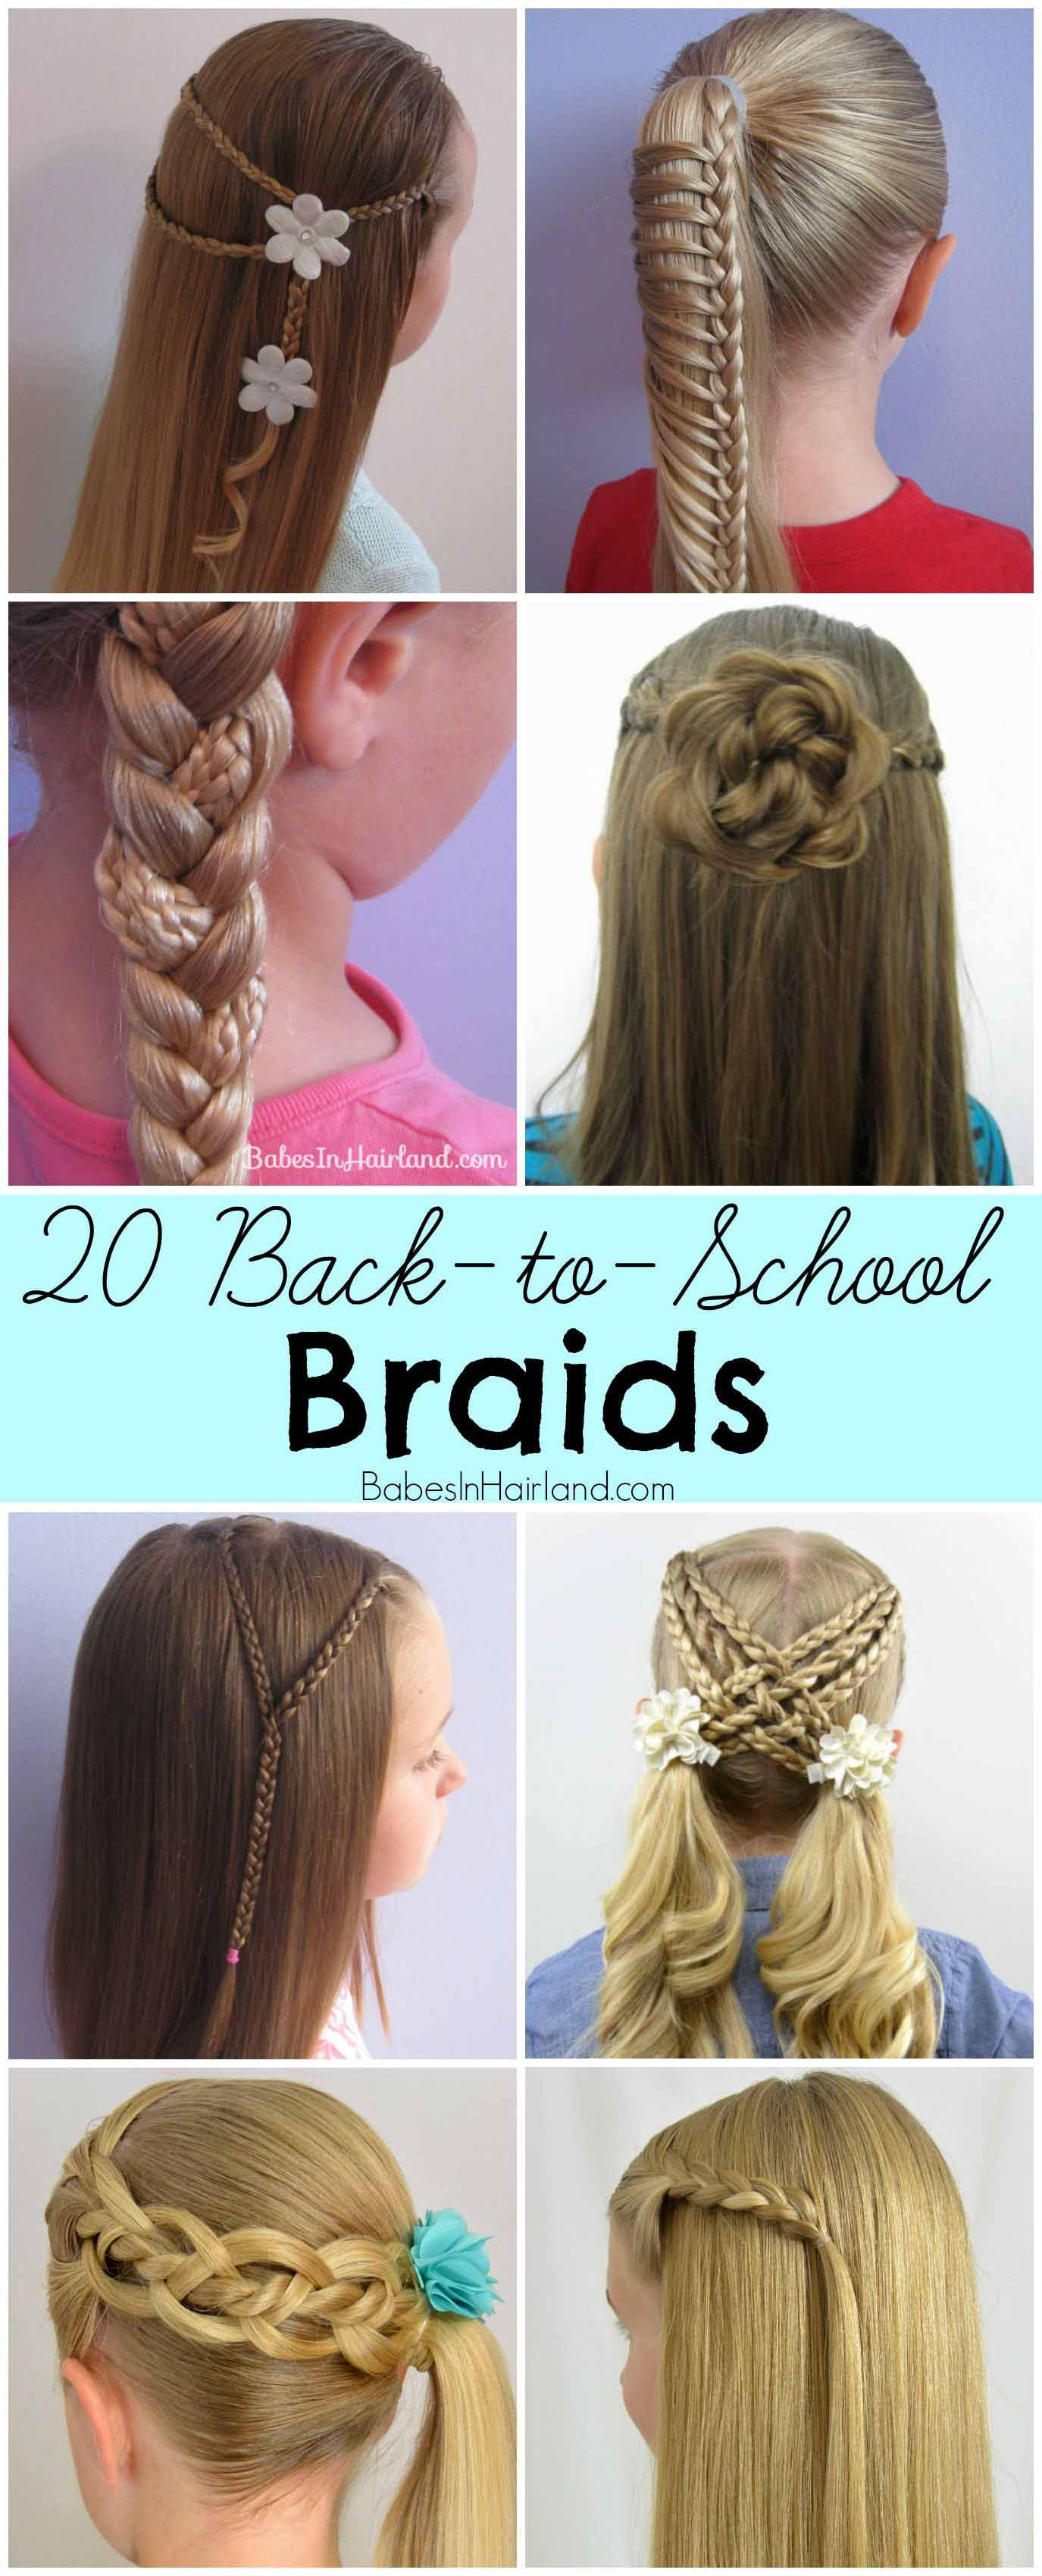 20 -school braids hair